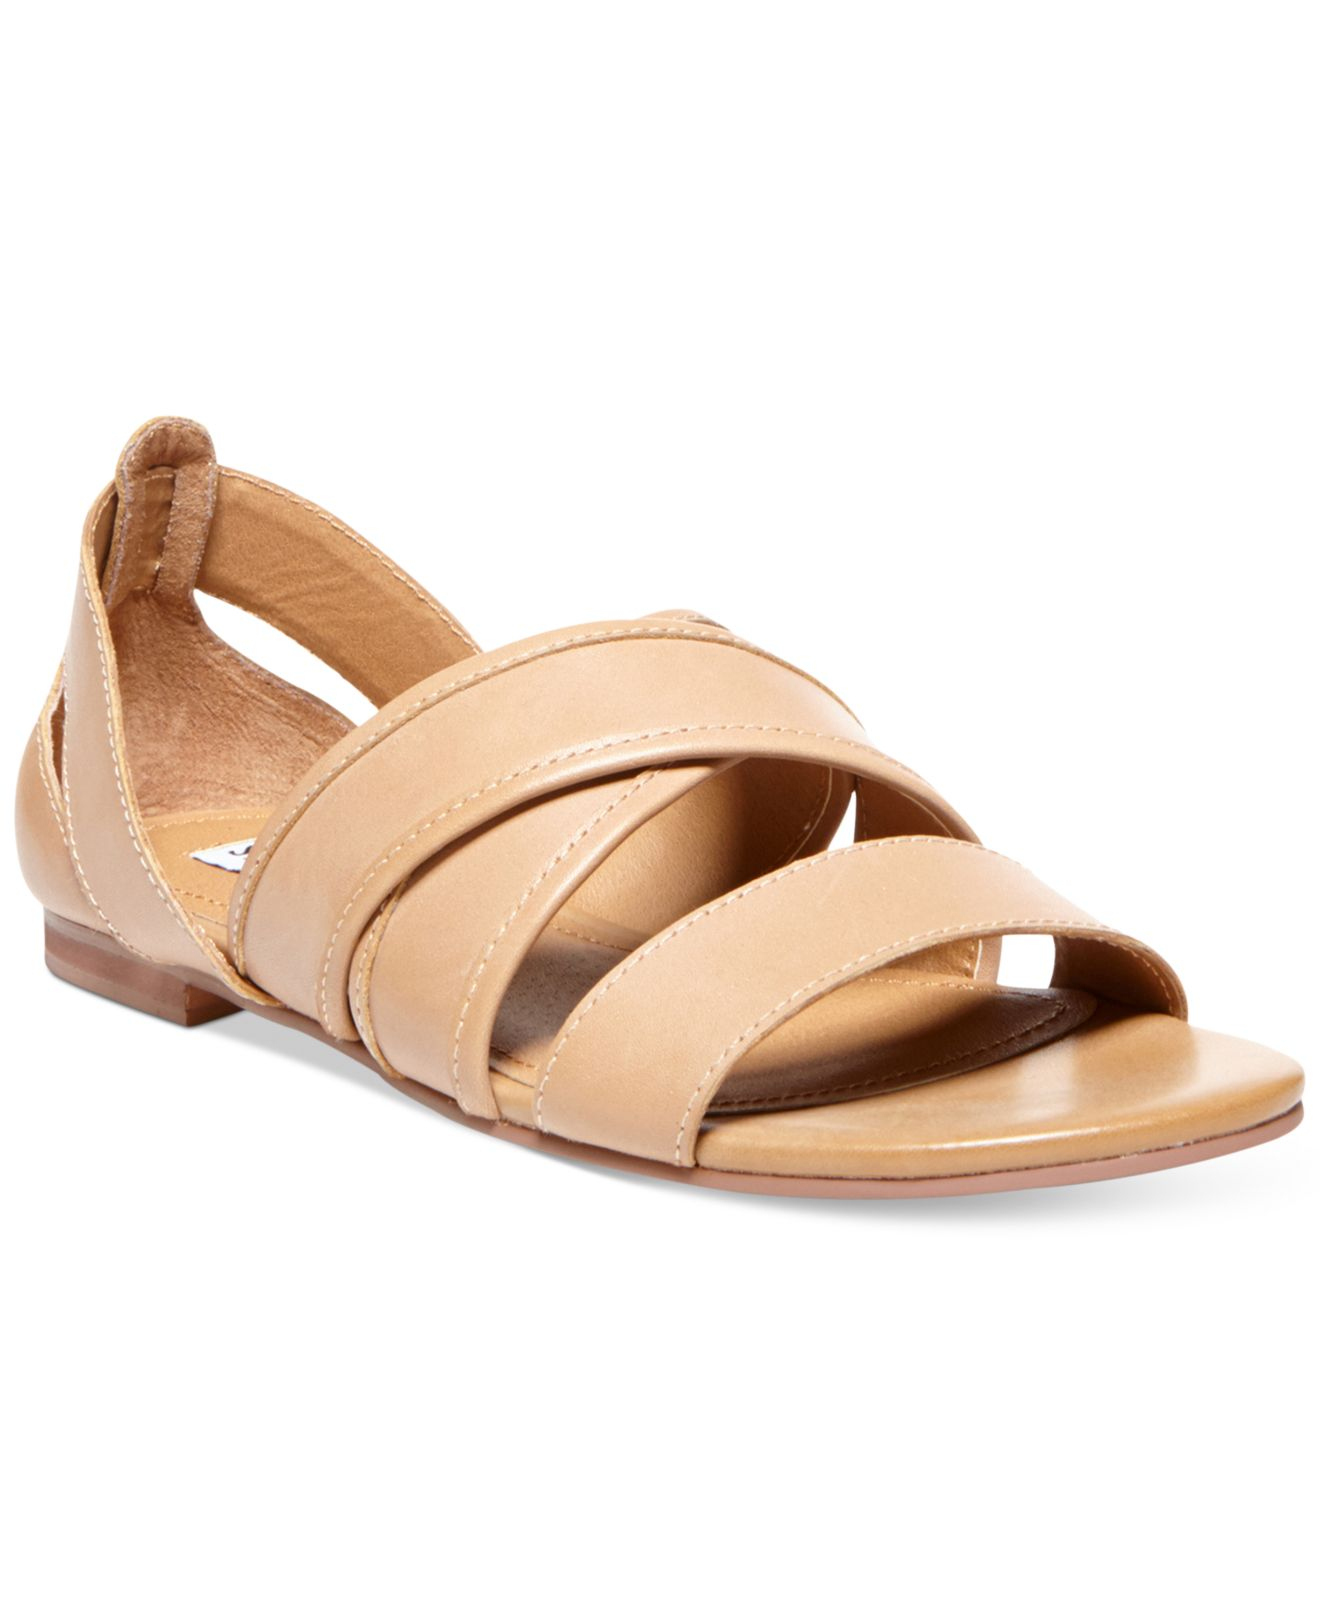 Steve madden women s korteous flat sandals in brown bone leather